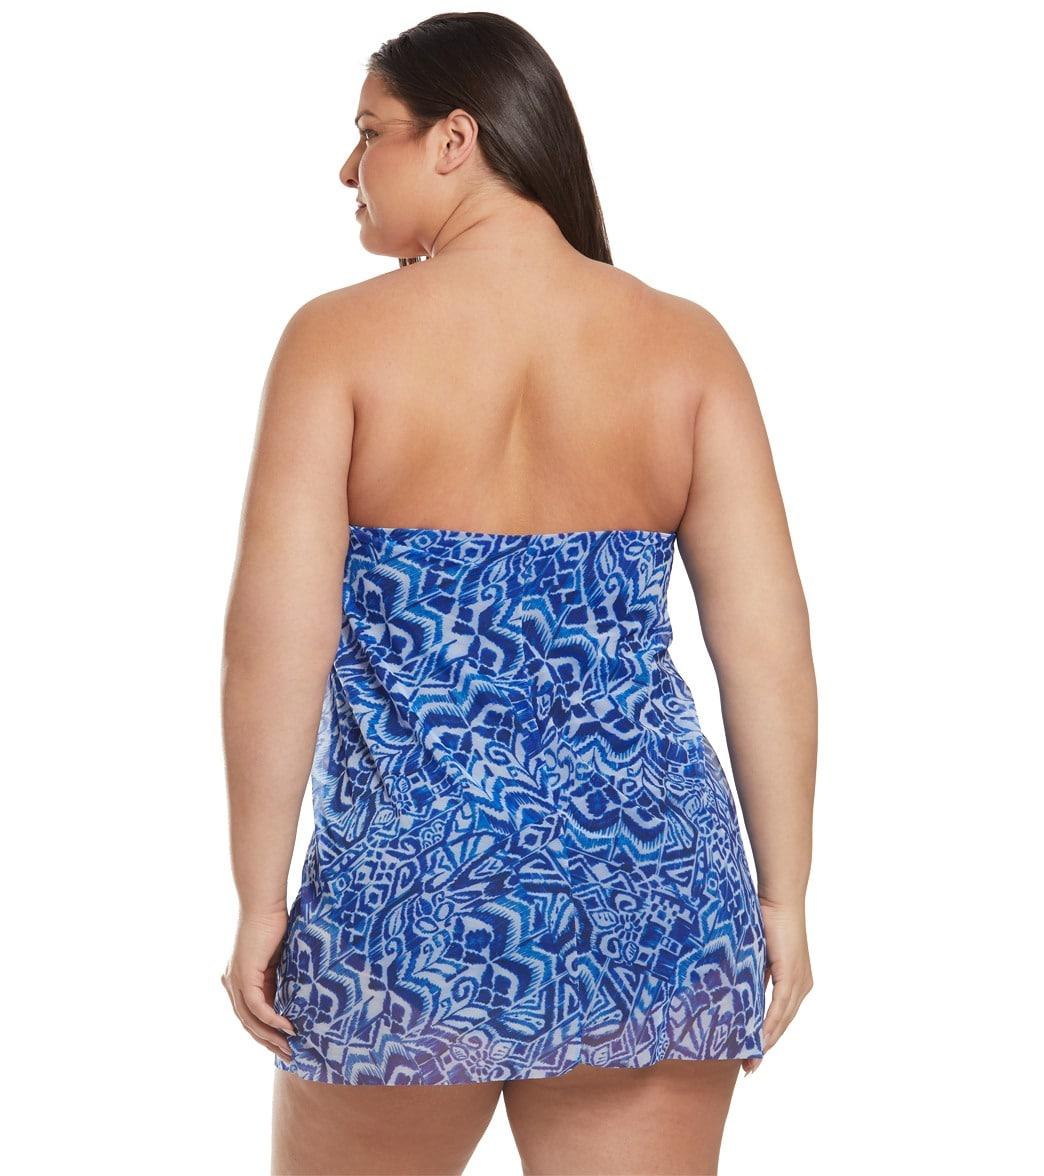 83644116a52c4 Lauren Ralph Lauren Plus Size Bias Tribal Ikat Convertible One Piece  Swimsuit